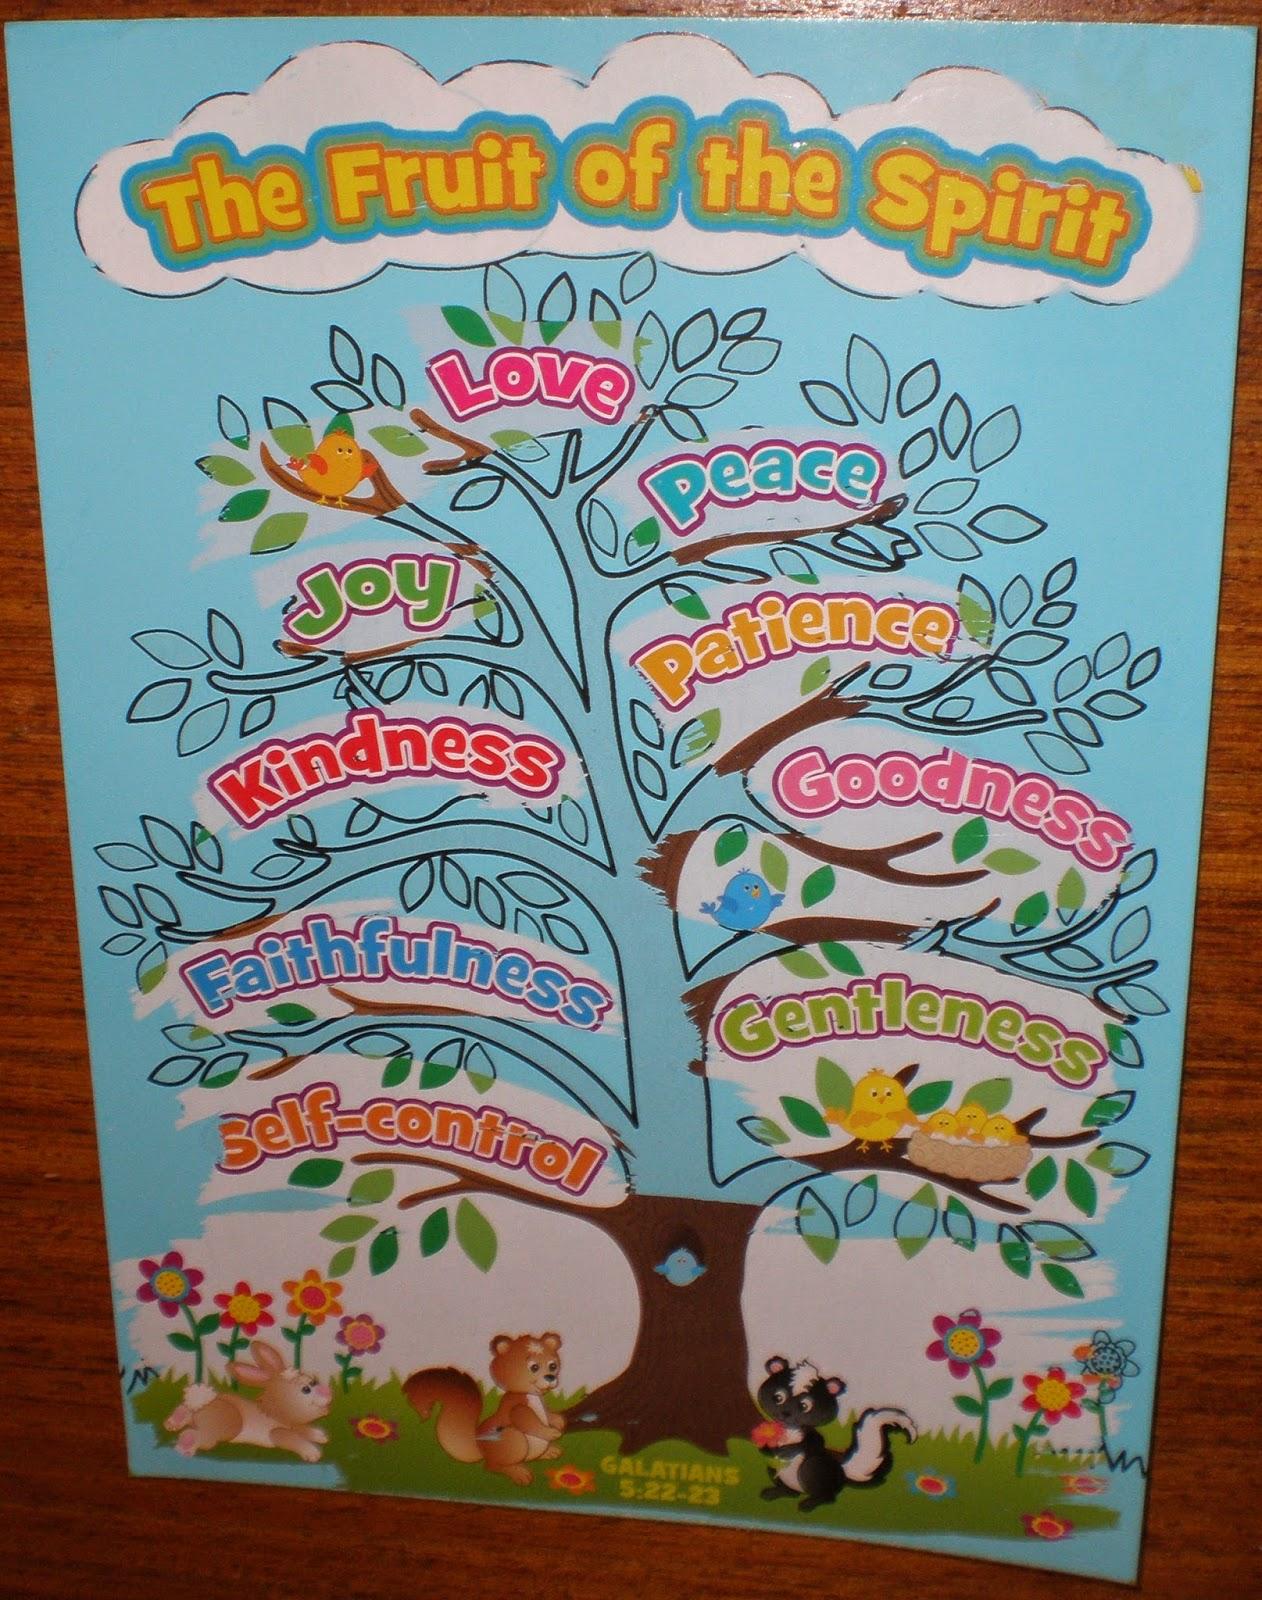 Petersham Bible Book Amp Tract Depot Fruit Of The Spirit